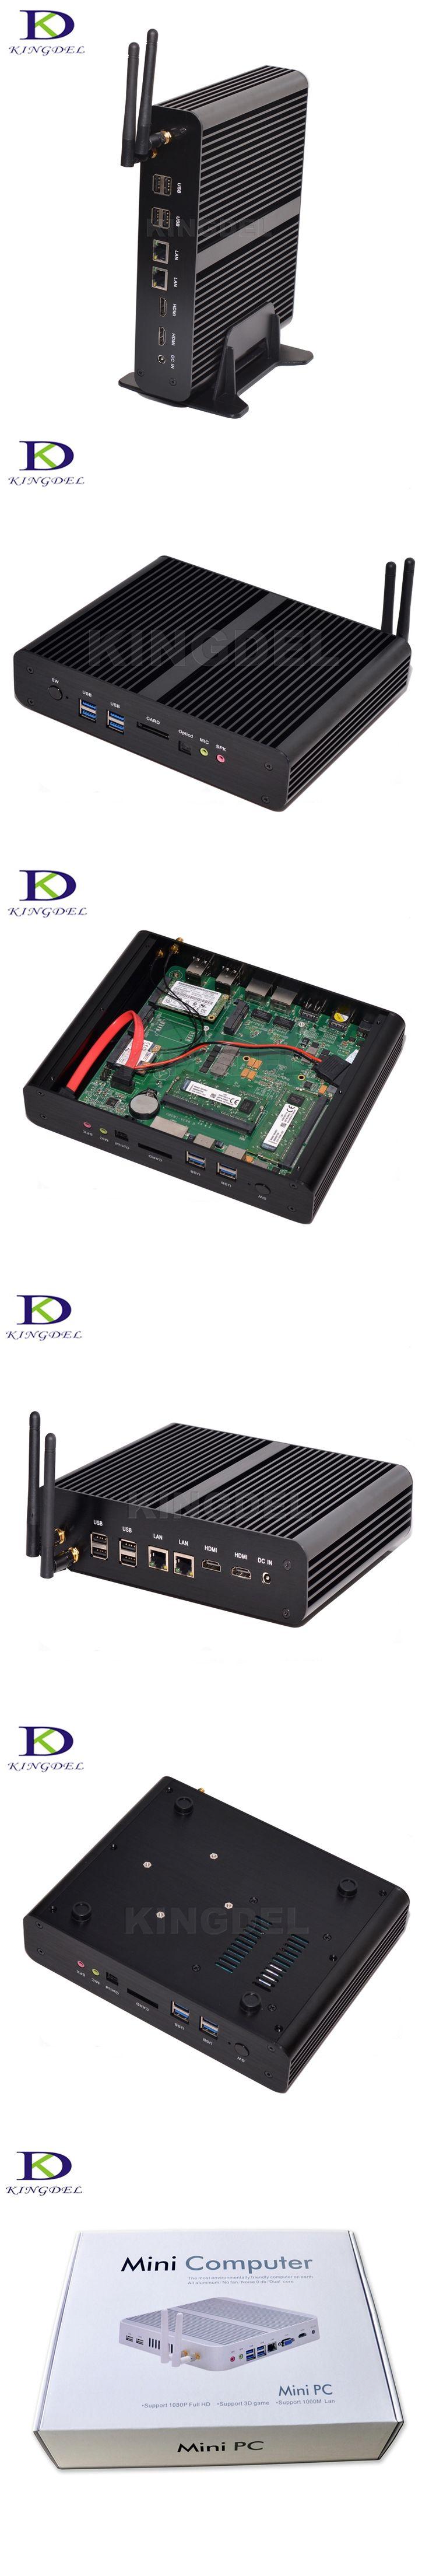 Hot on Sale Windows 10 Fanless Mini PC Intel Core i7 5500U 5550U Dual LAN Desktop Computer Dual HDMI HTPC with SD Card Reader